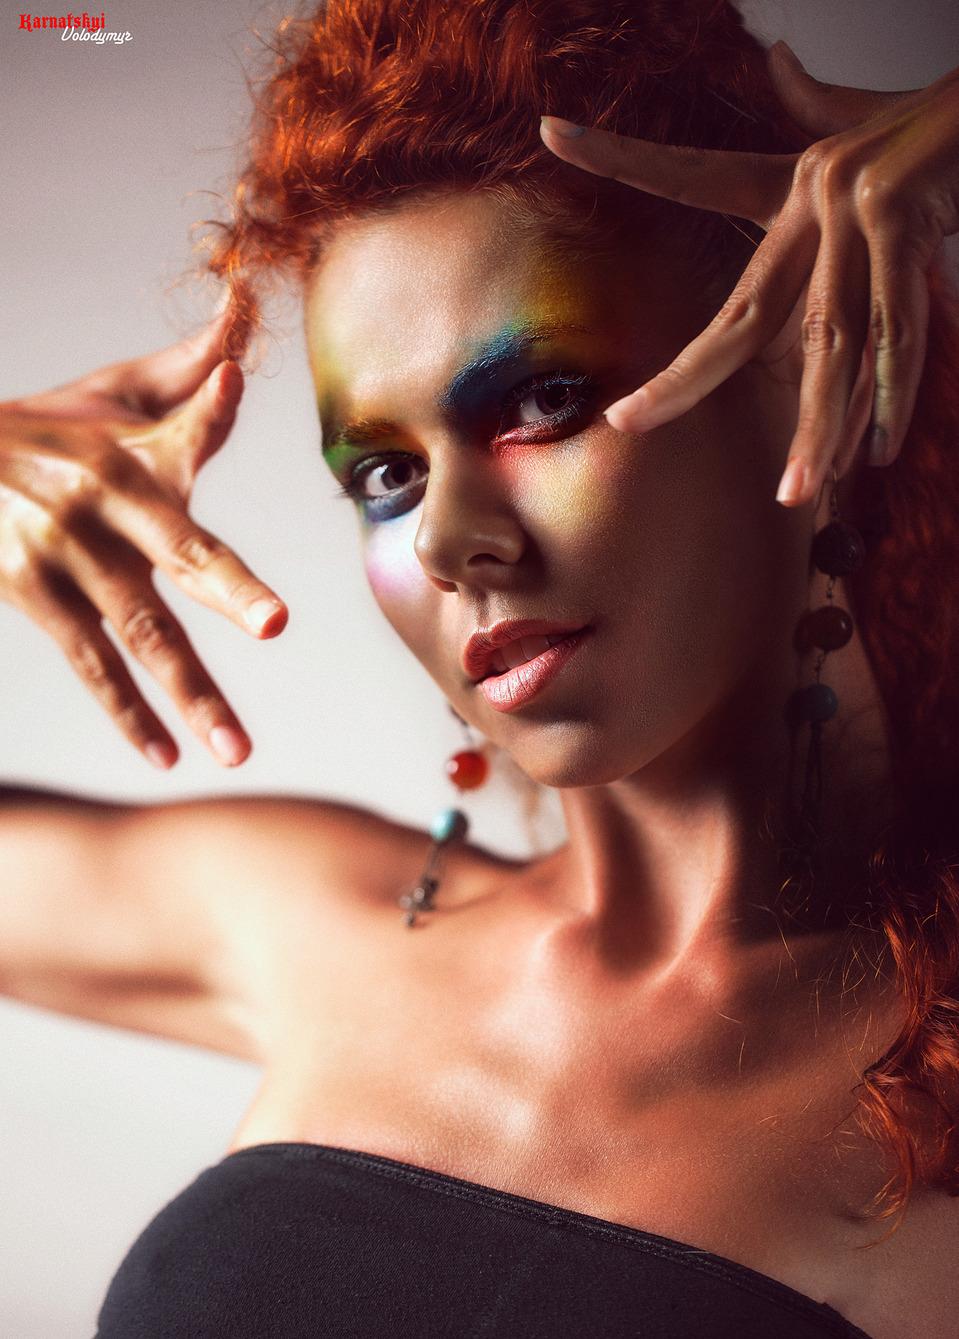 Tanned Ksenya | tan, girl, model, make-up